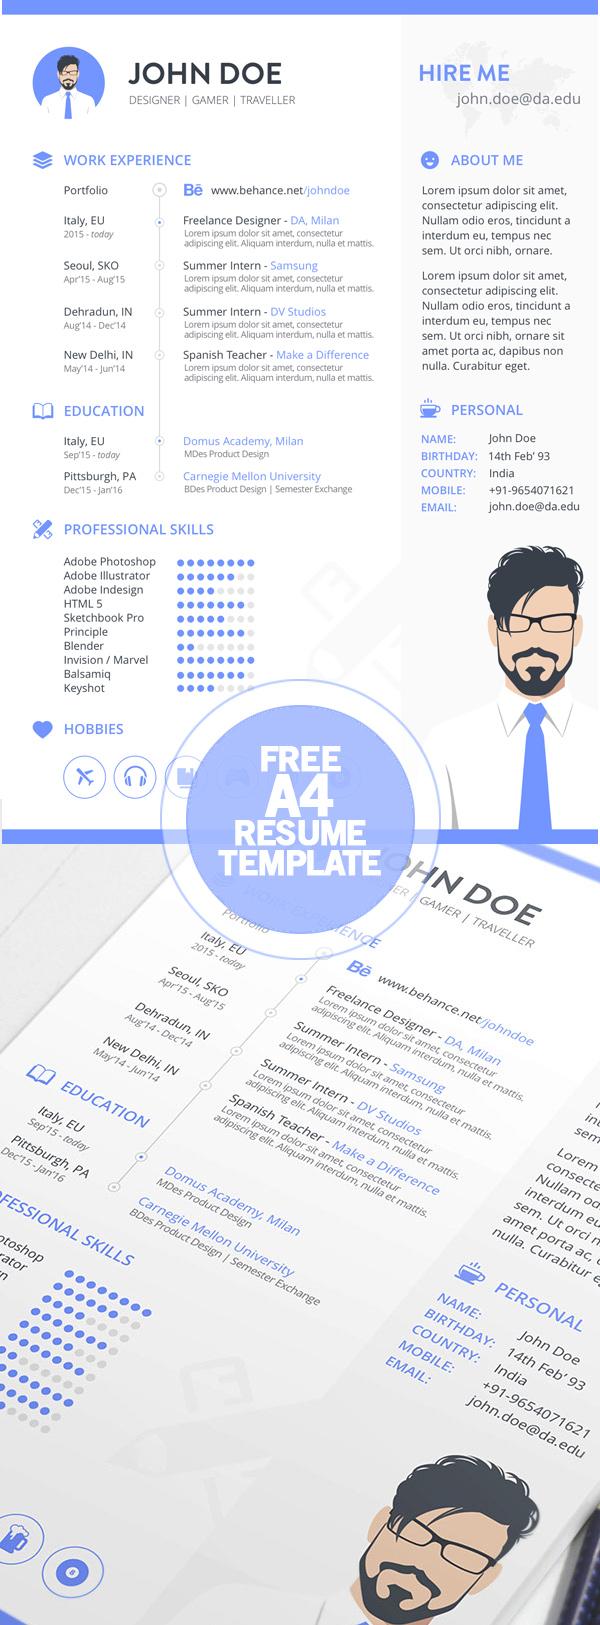 006_free_cv_resume_template